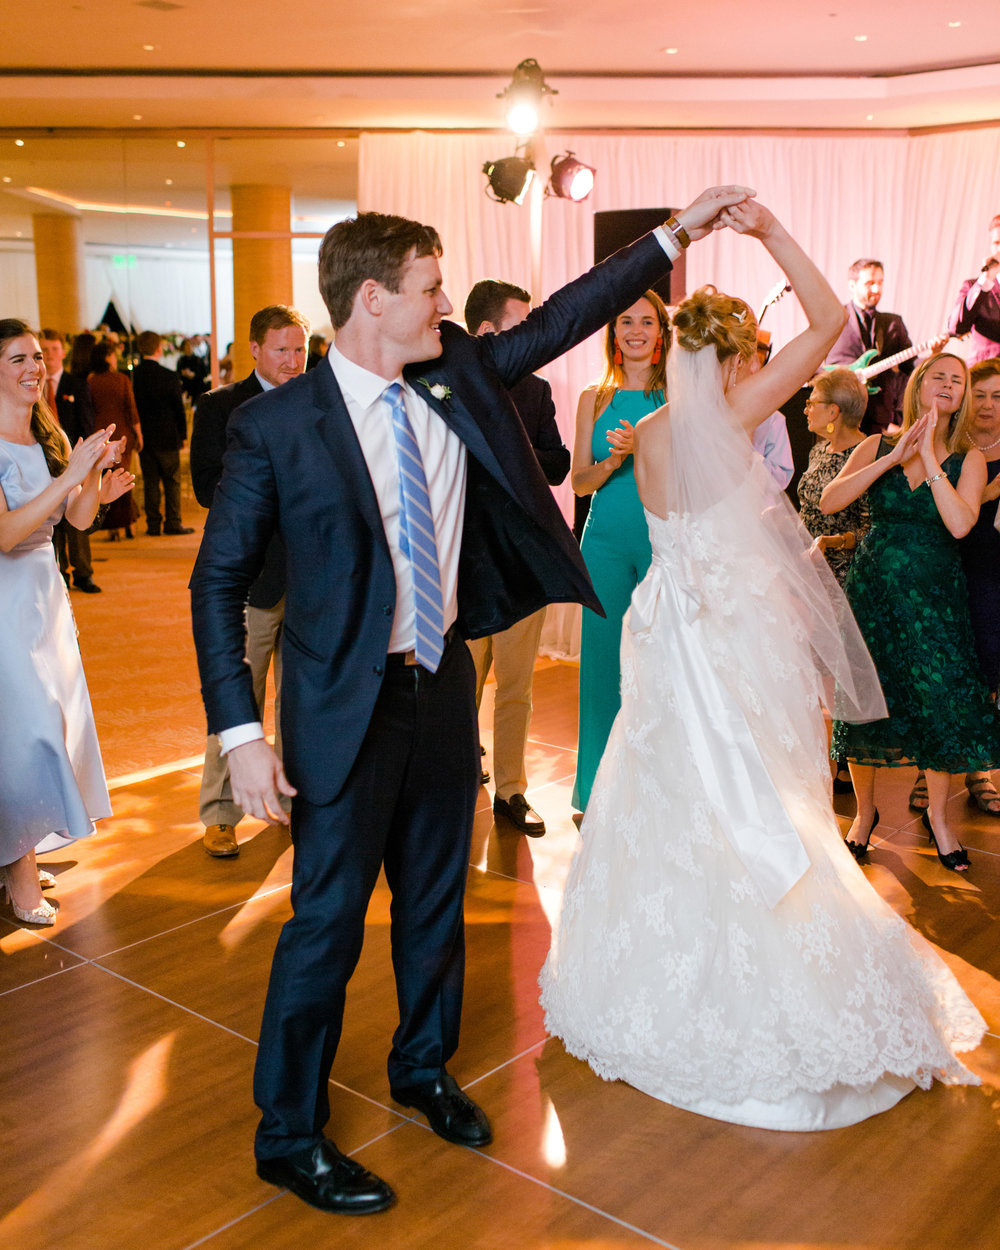 biltmore_santa_barbara_wedding_photos_coral_casino_068.jpg